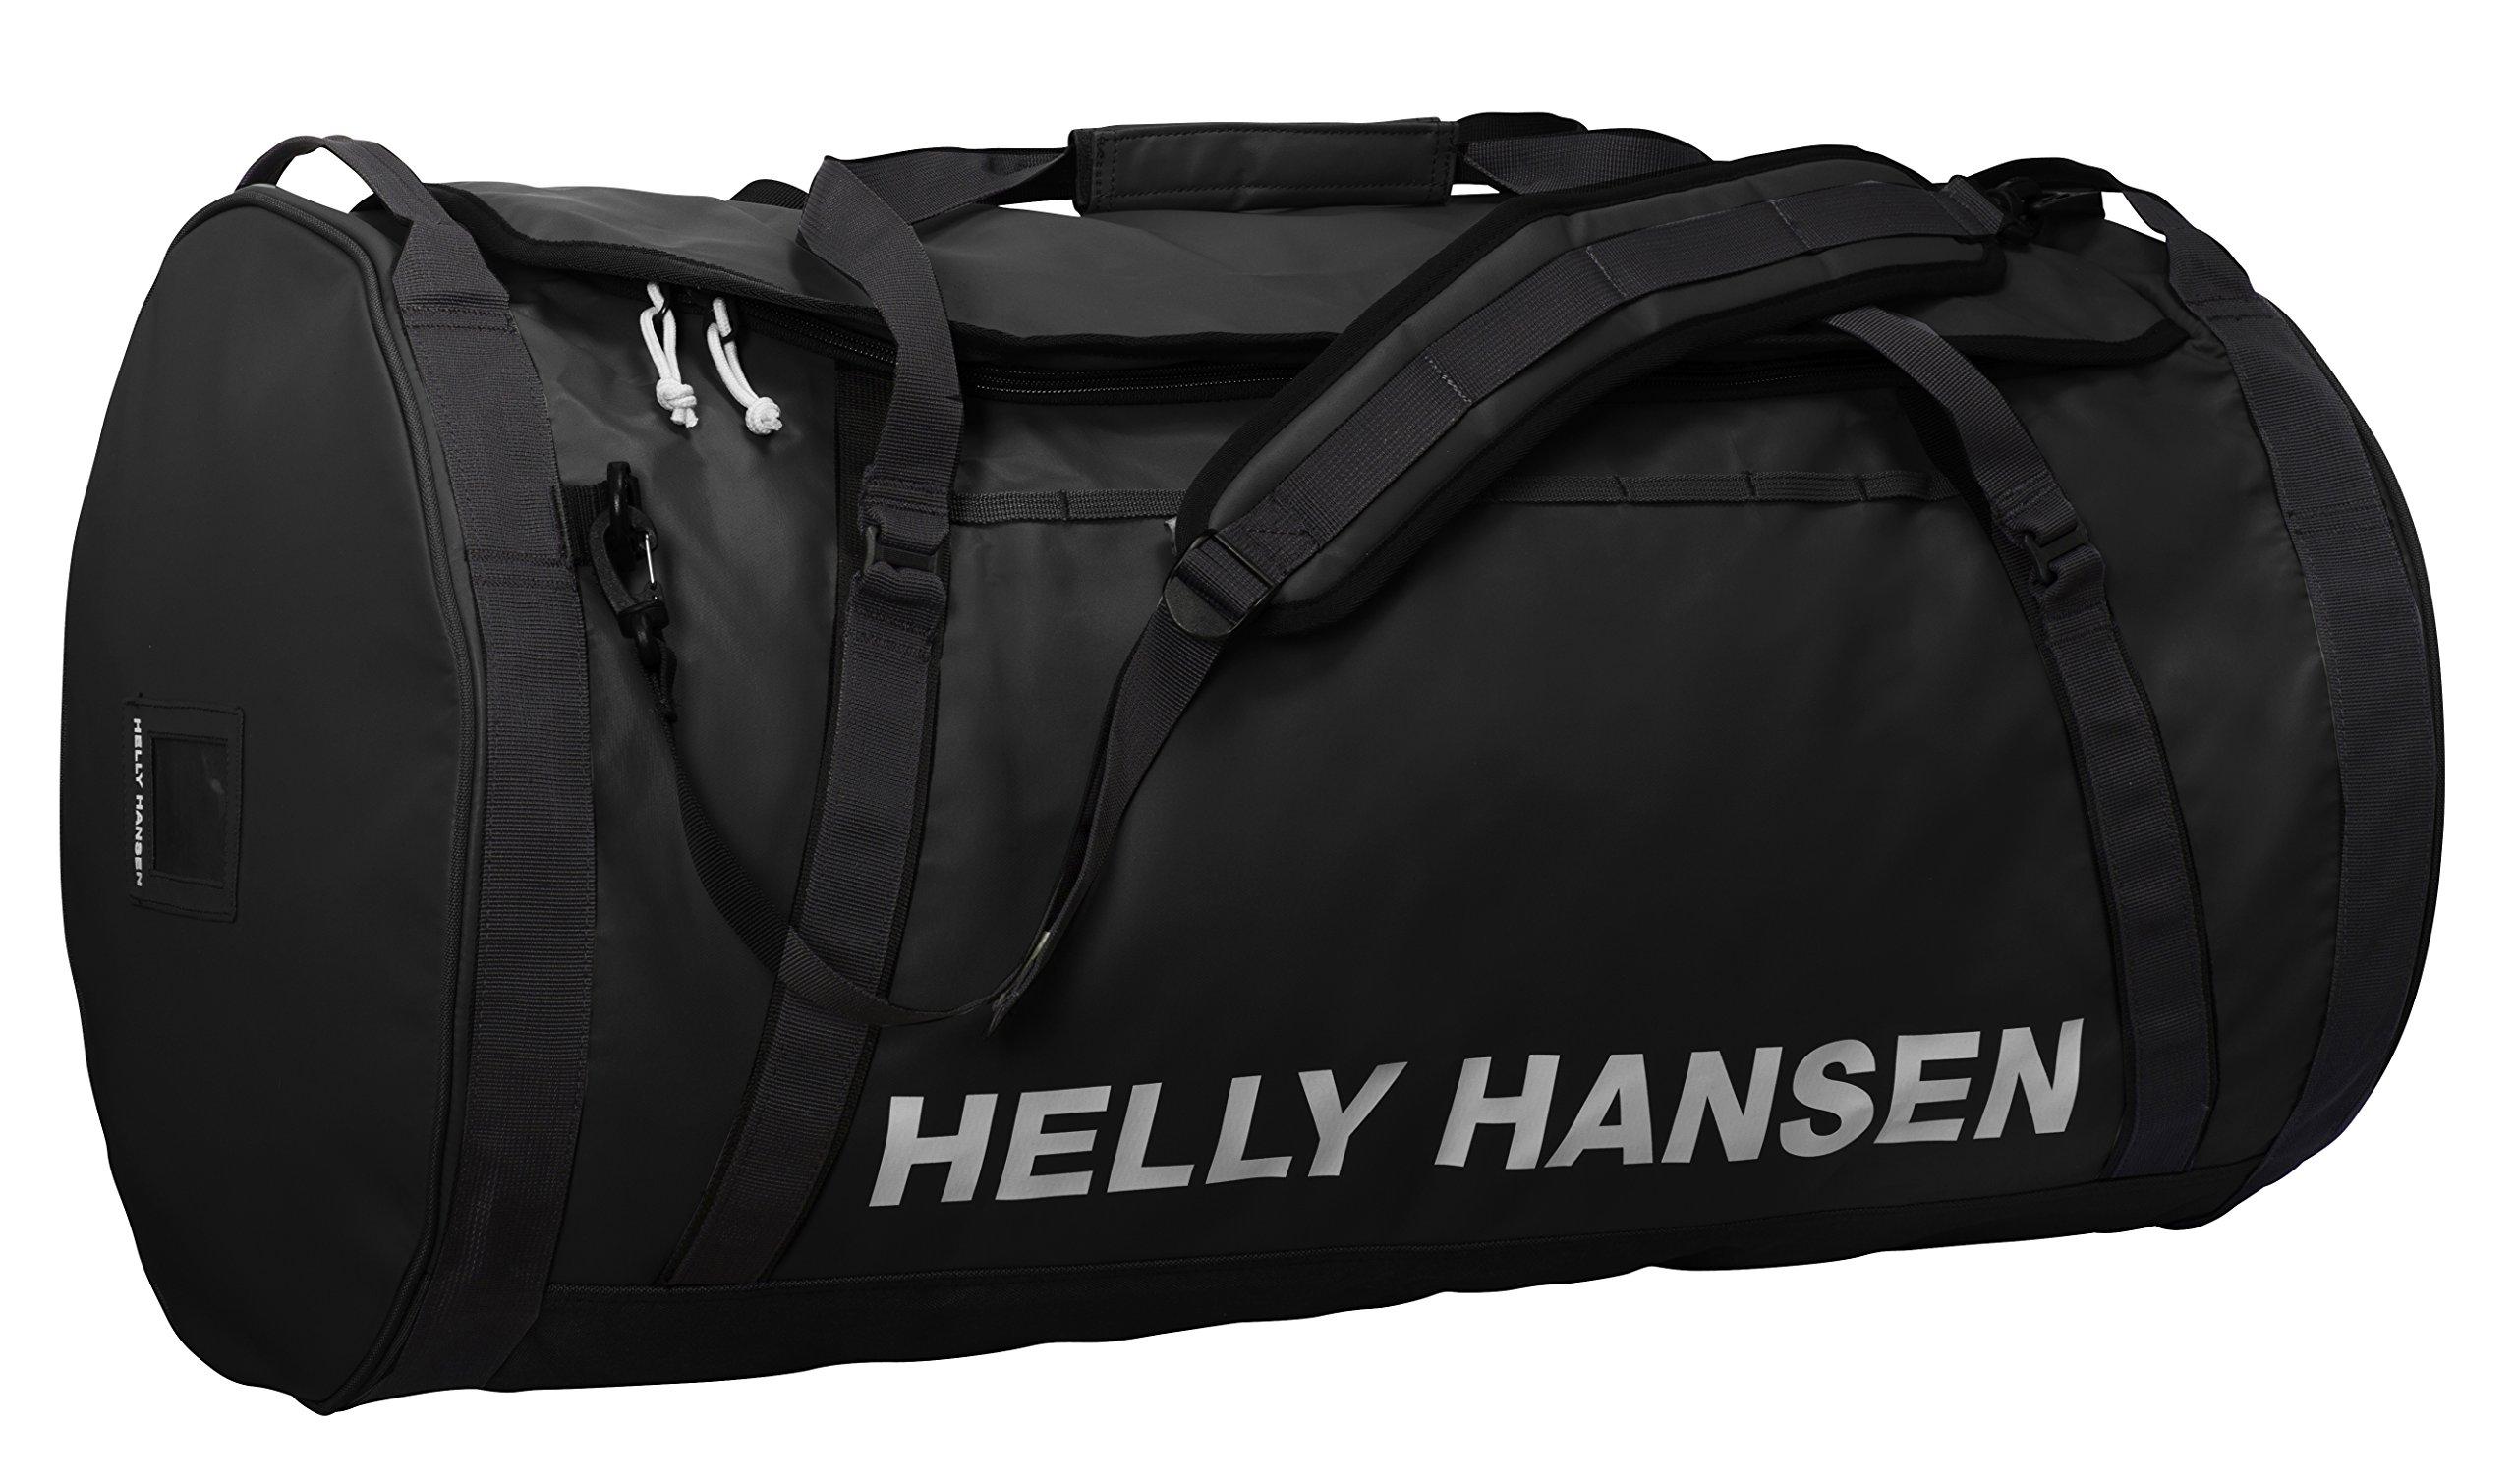 Helly Hansen Duffel 2 Water Resistant Packable Bag with Optional Backpack Straps, 50-liter (Medium), 990 Black